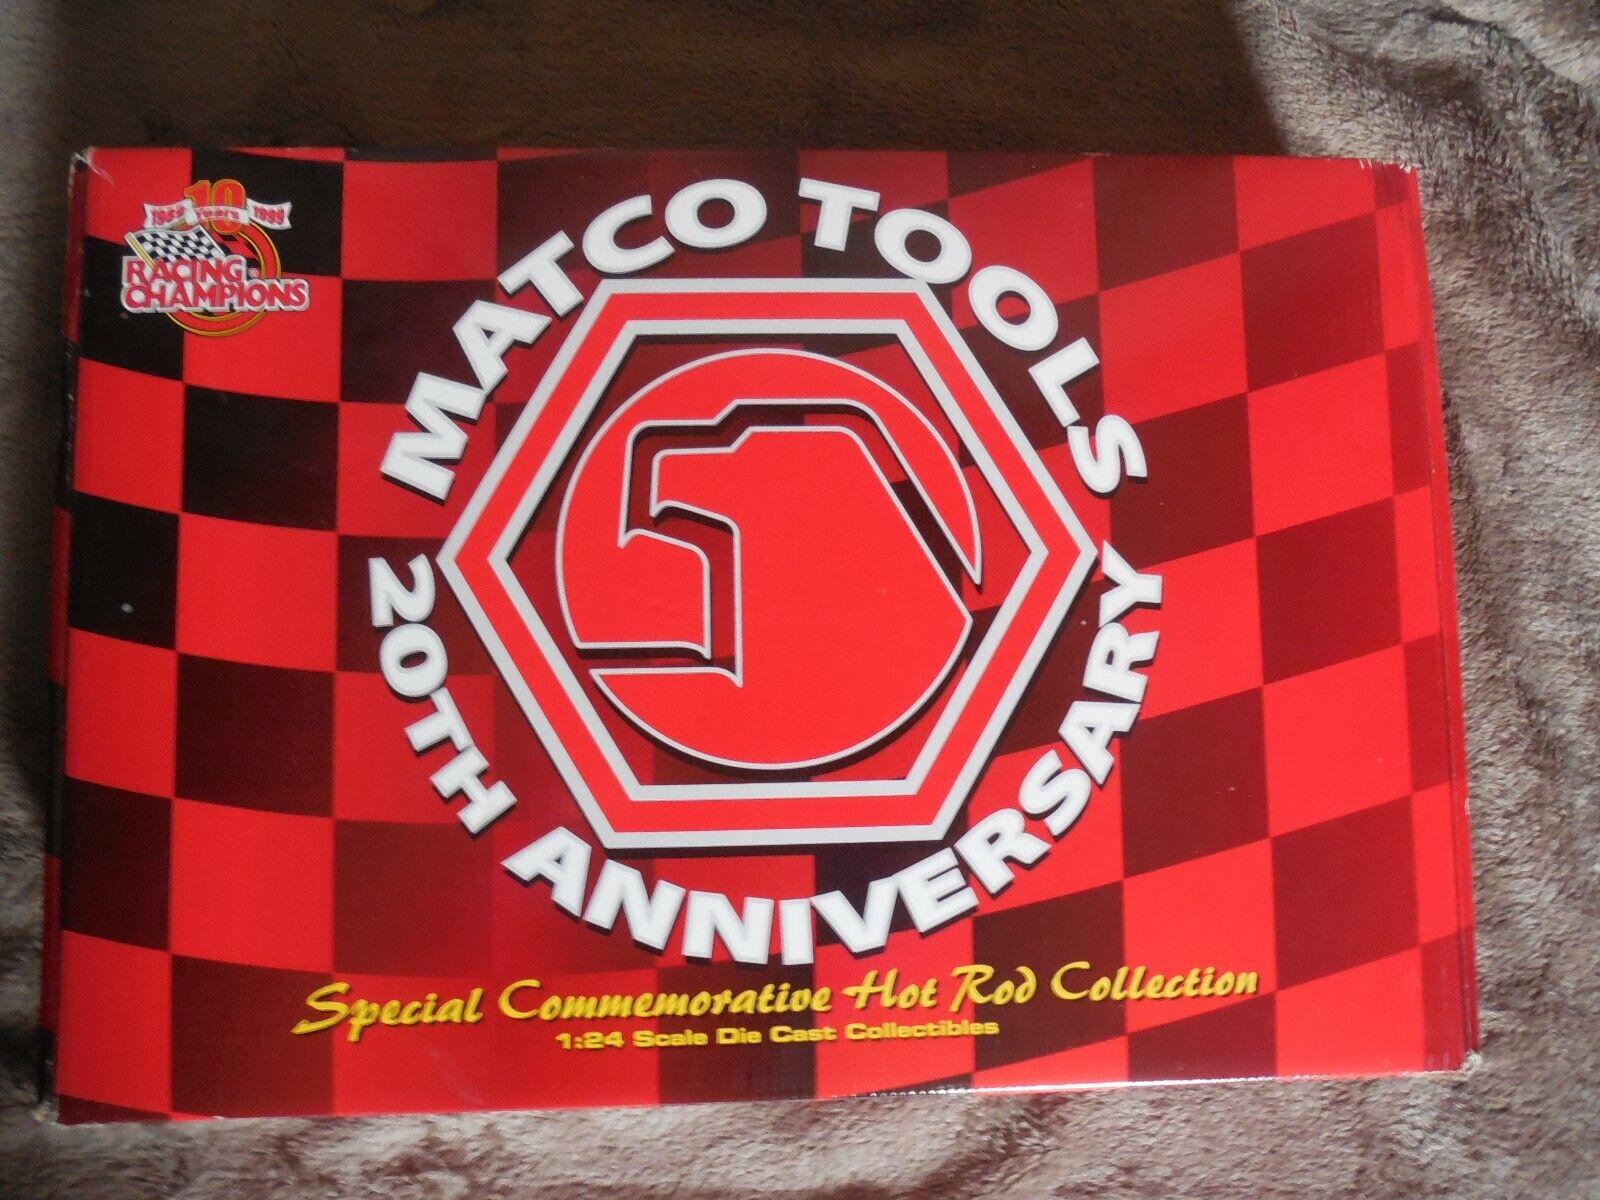 C2-Racing Champions Matco Tools Racing Set 20th anniversary